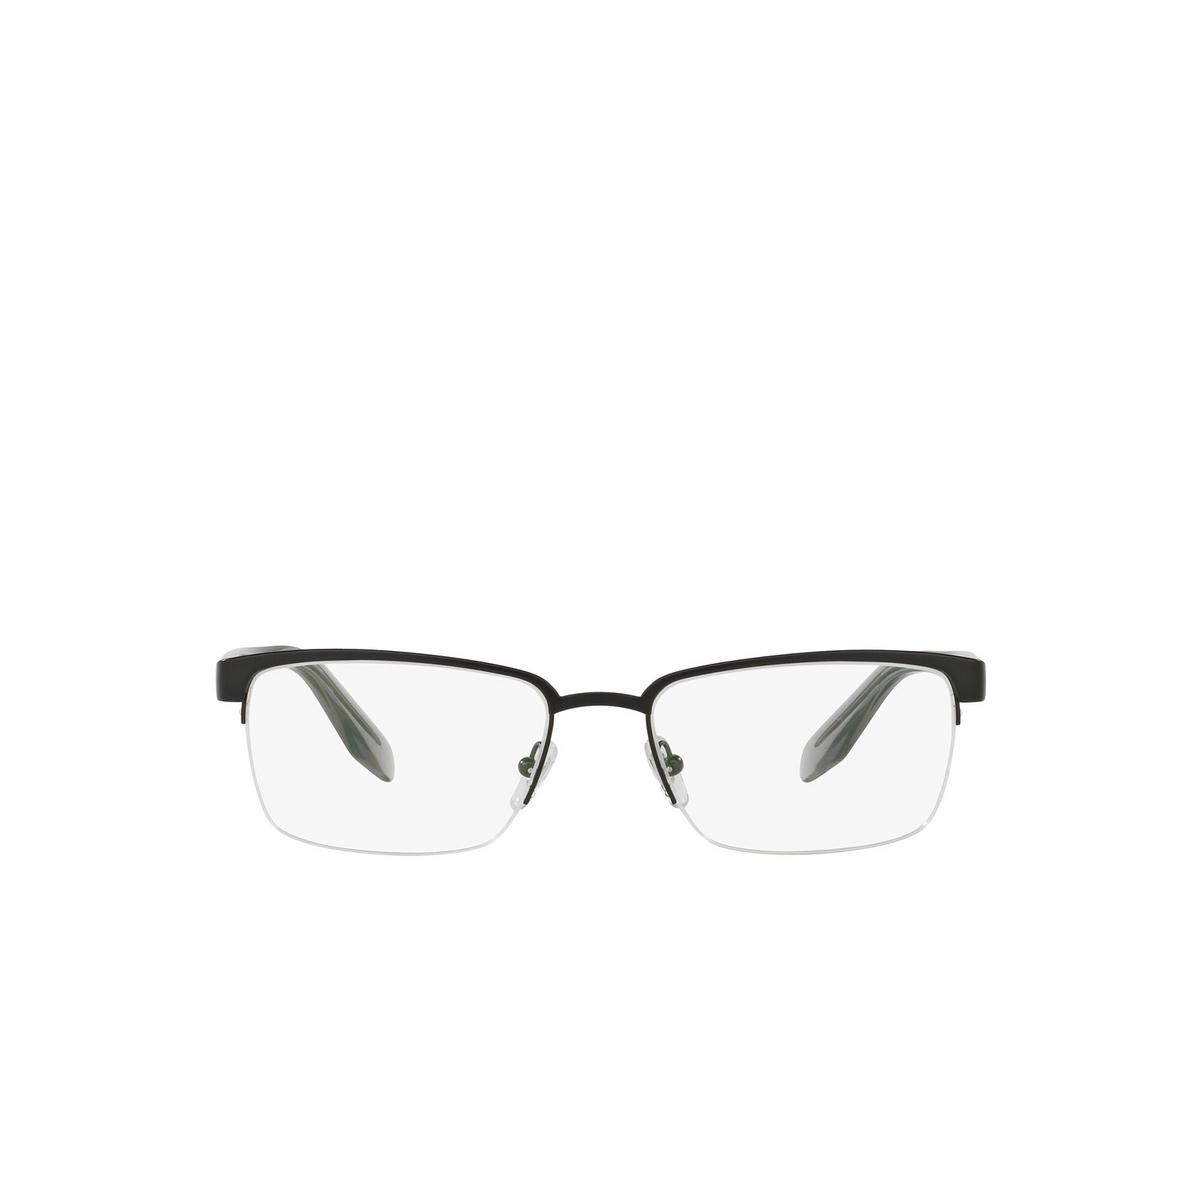 Versace® Rectangle Eyeglasses: VE1241 color Matte Black 1261 - front view.